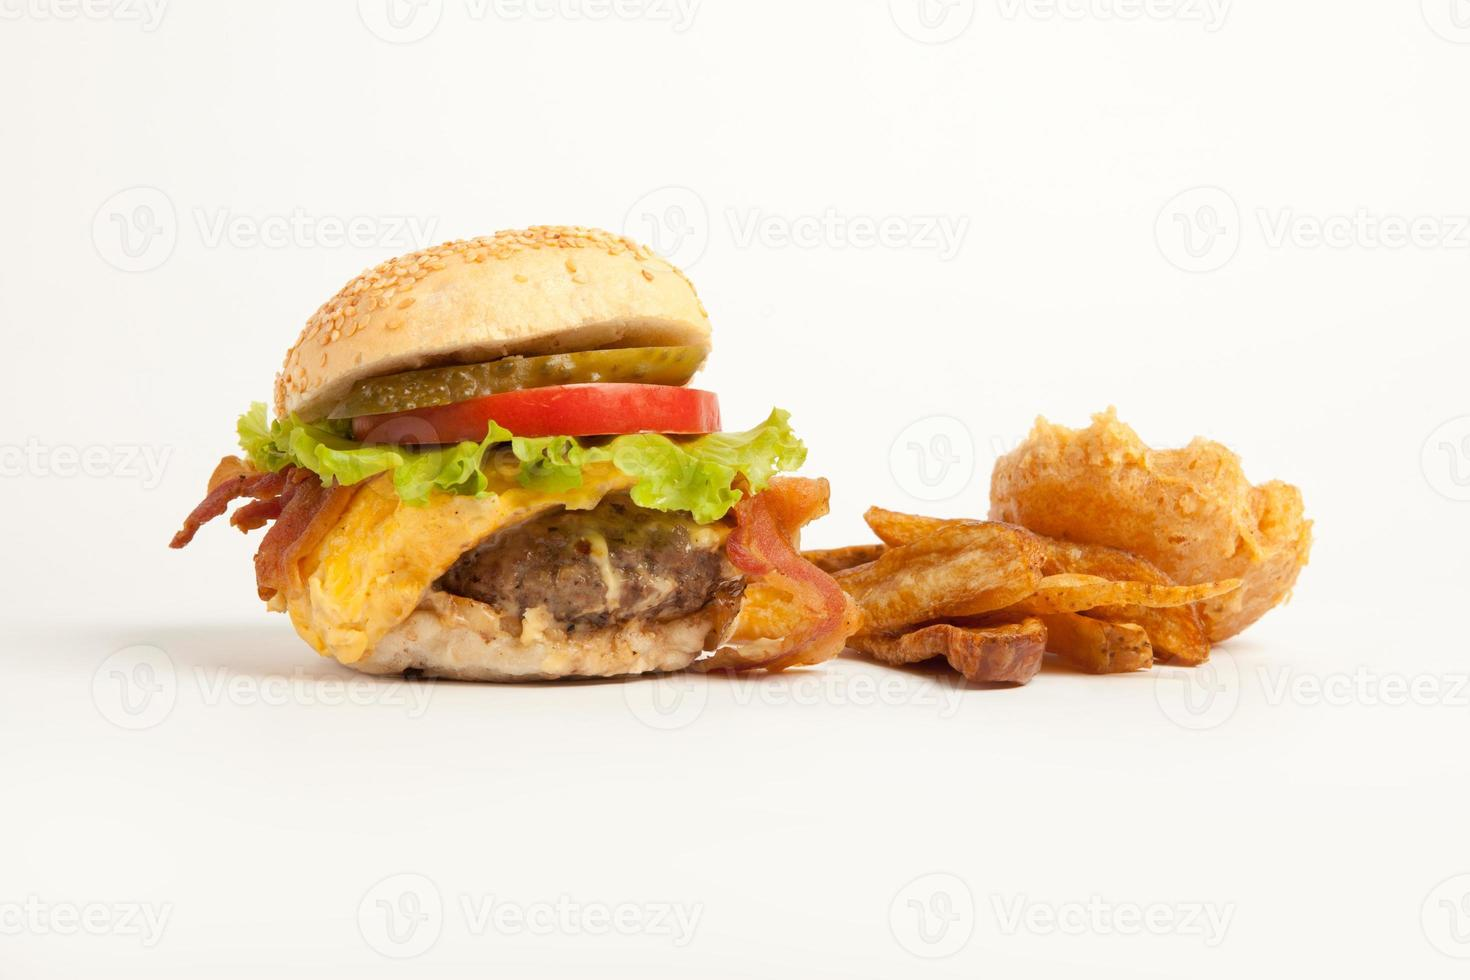 hamburguesas y papas fritas sobre fondo blanco foto